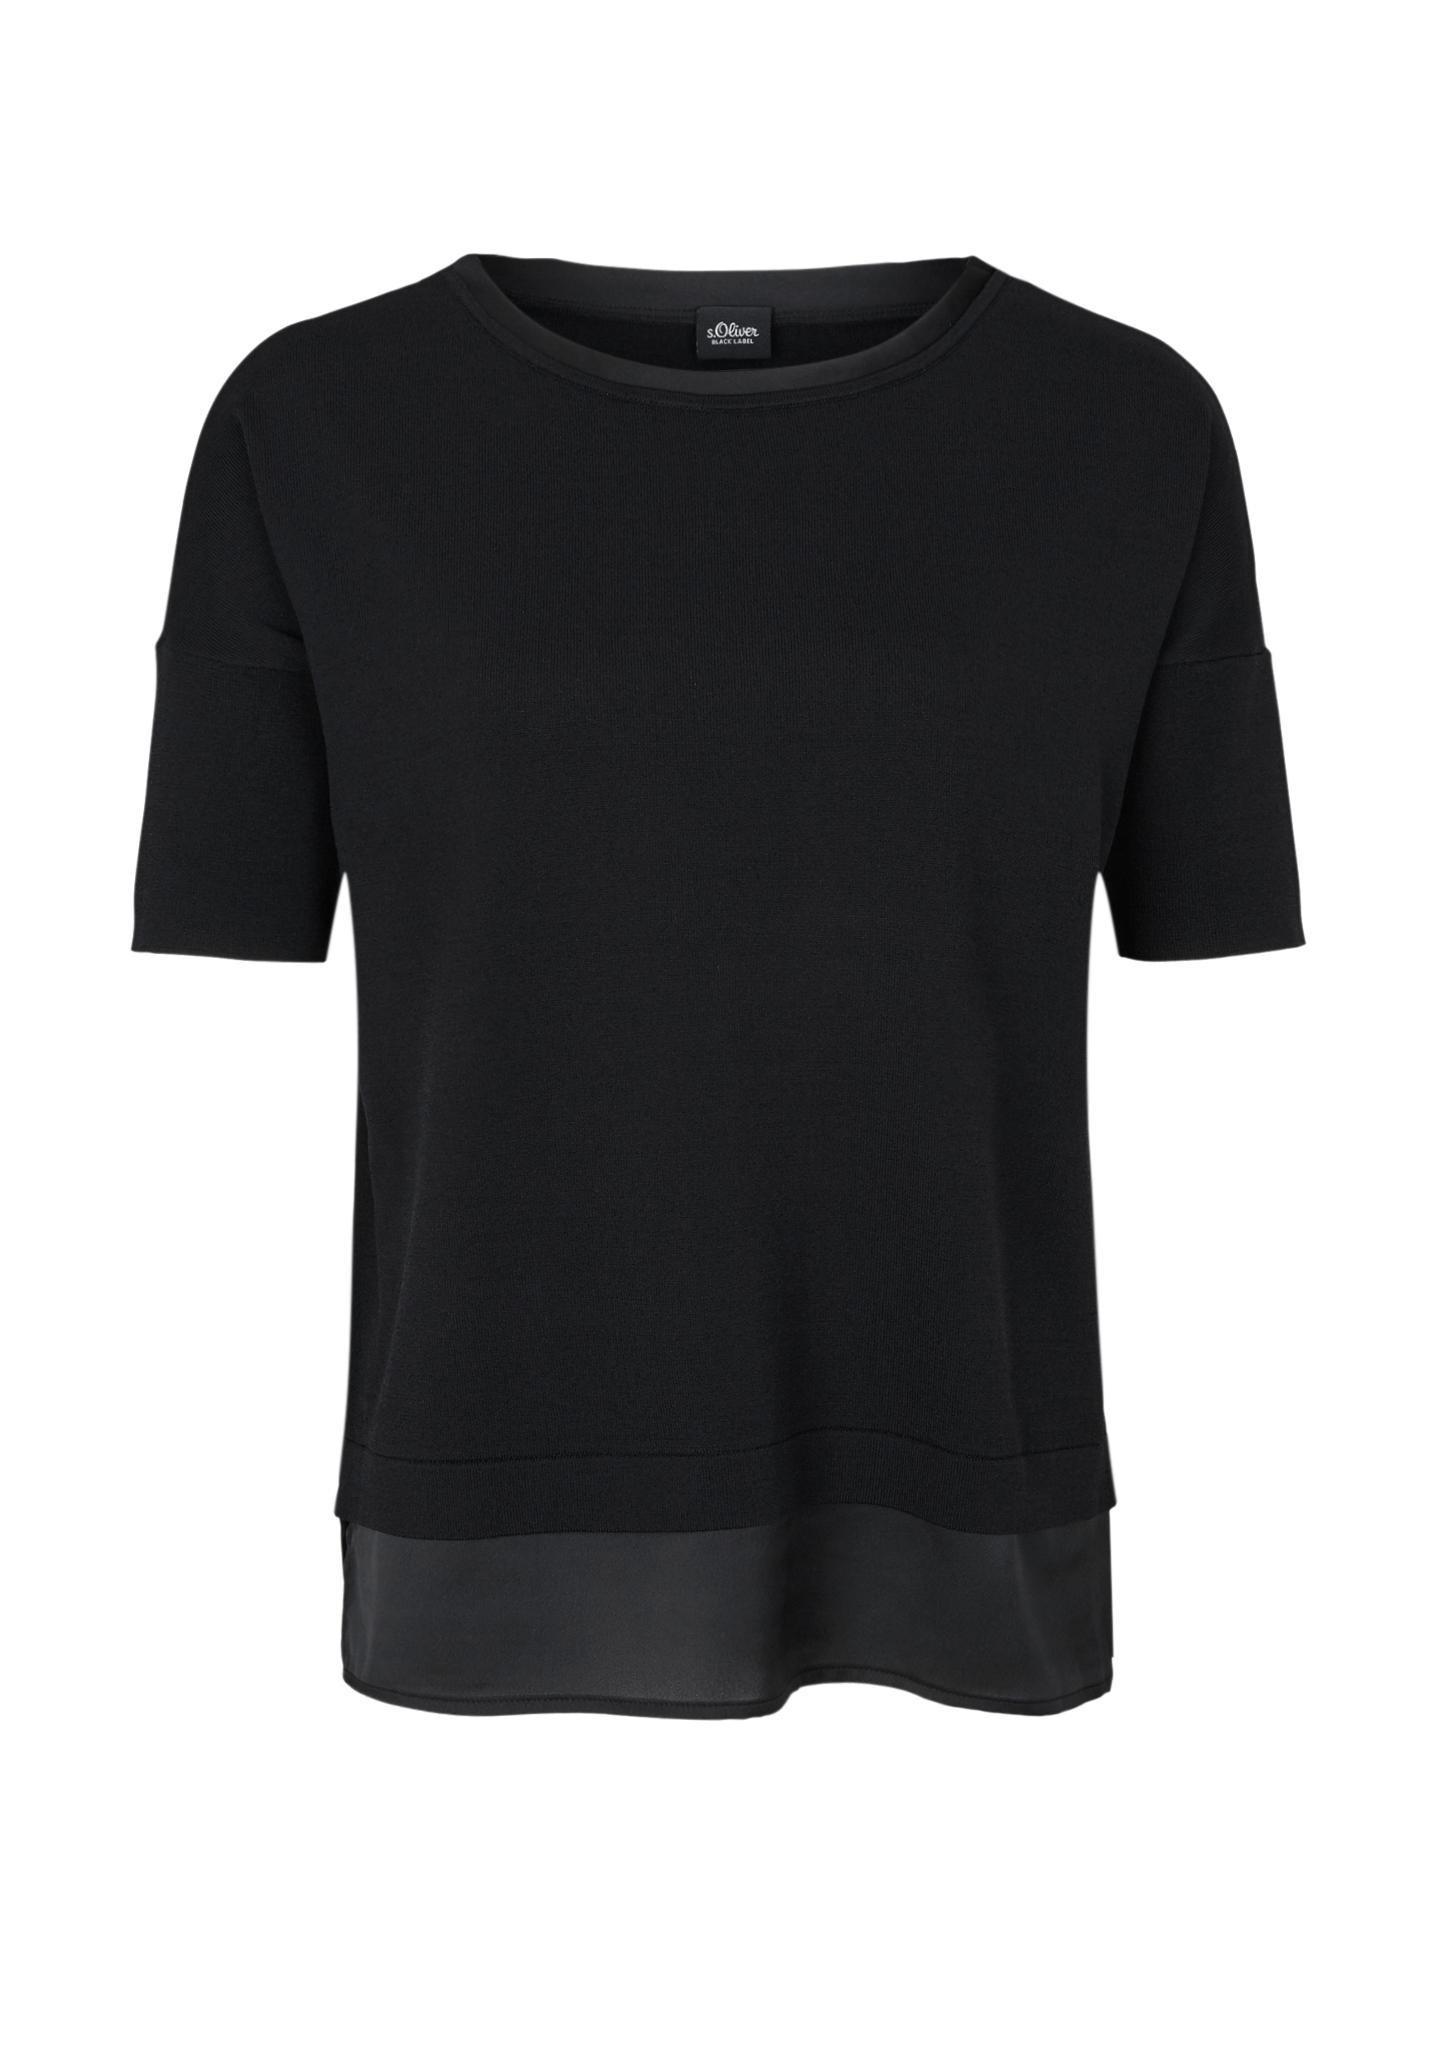 Kurzarmpullover | Bekleidung > Pullover > Kurzarmpullover | Schwarz | Oberstoff: 65% viskose -  35% polyamid: blende: 100% polyester | s.Oliver BLACK LABEL